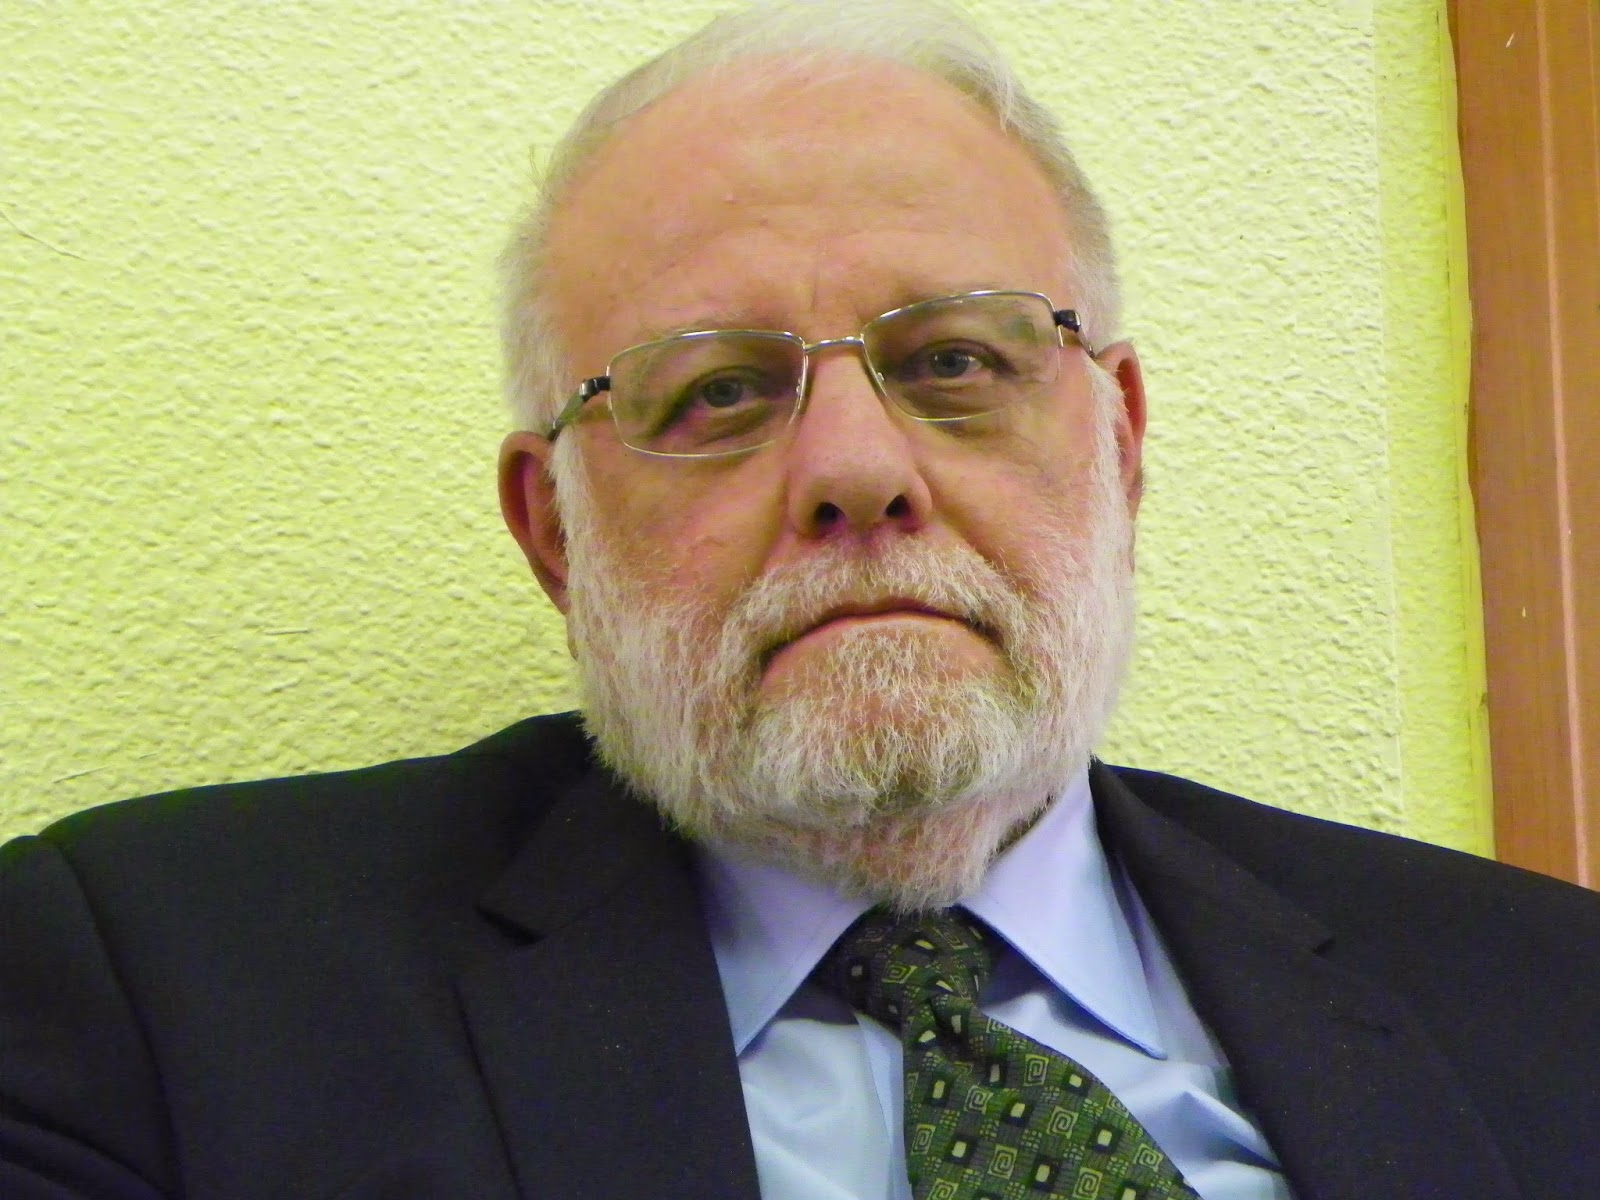 Entrevista Al Presidente De Ucide Sobre La Ensenanza Religiosa Islamica